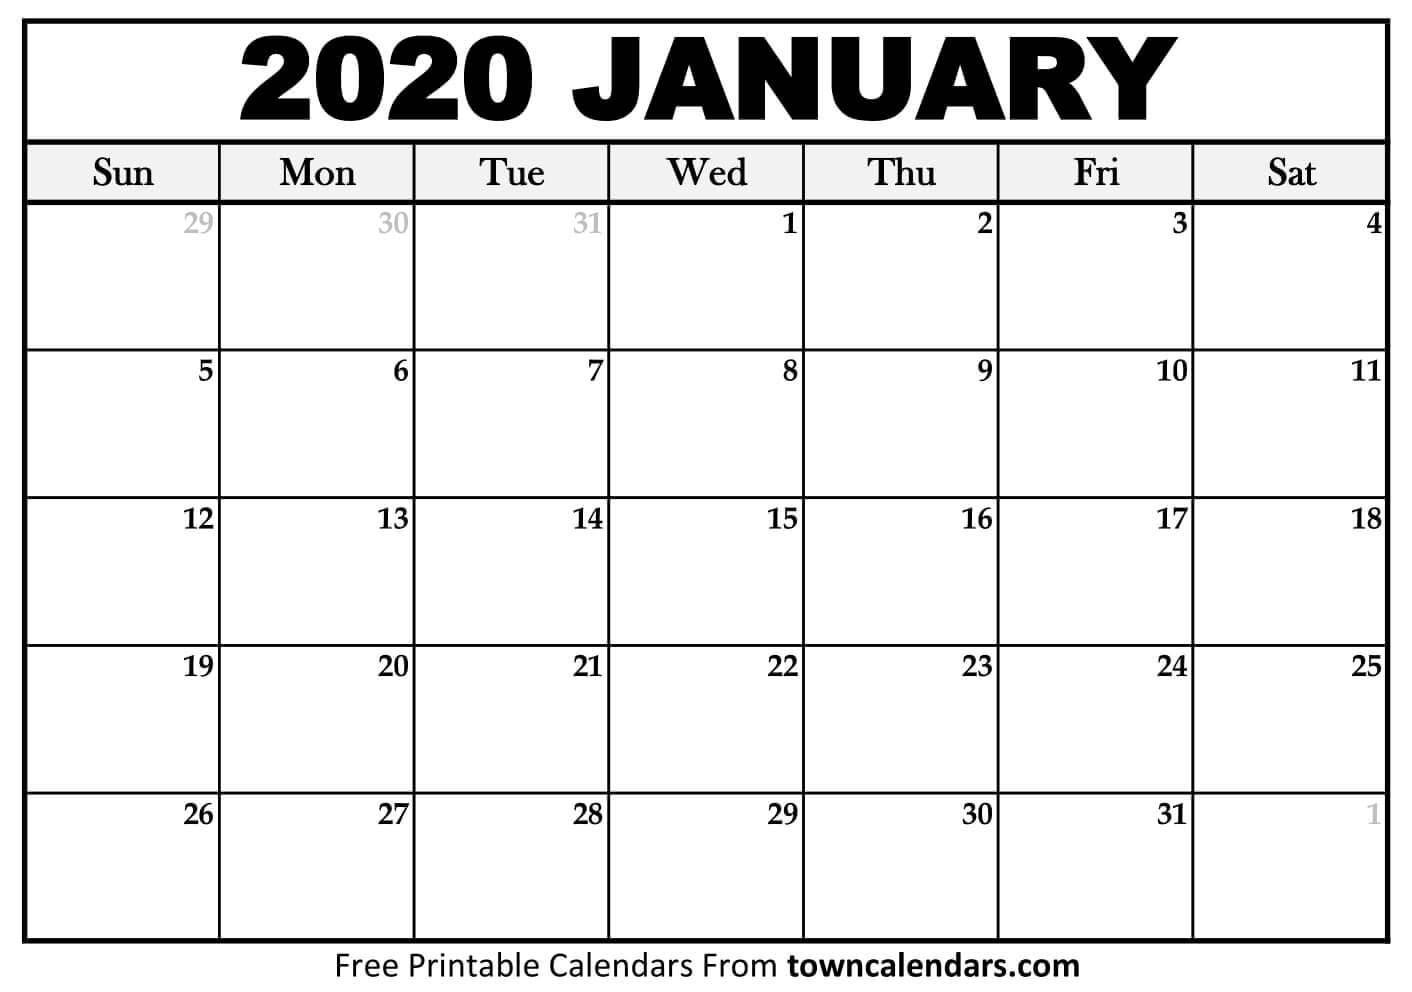 Calendar 2020 January - Togo.wpart.co